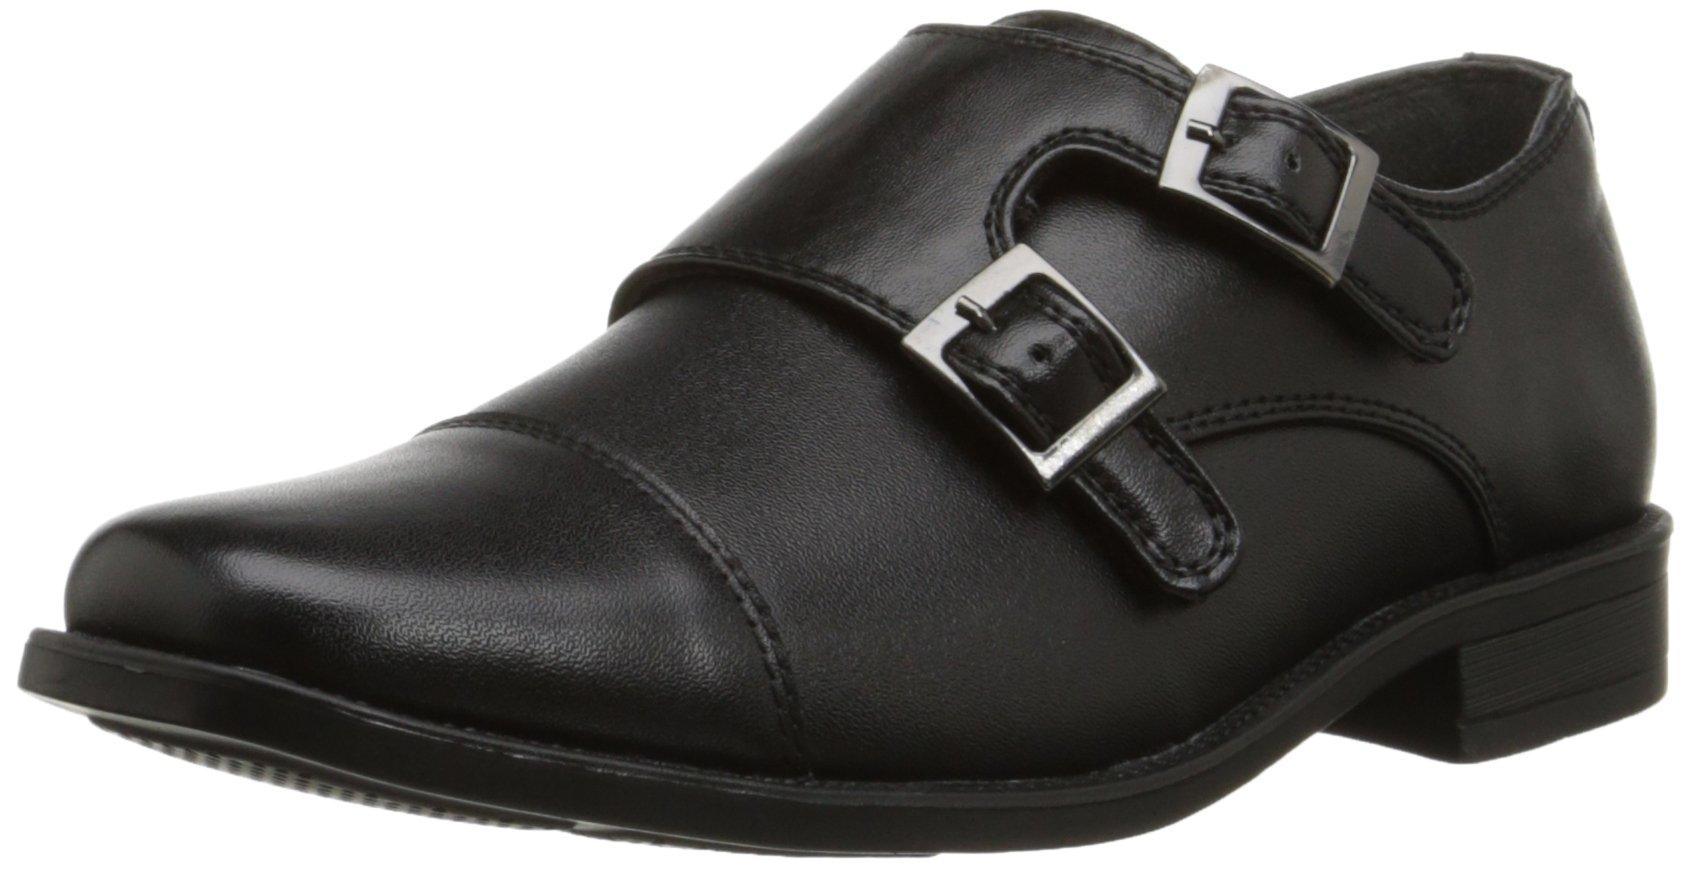 Steve Madden Chaaz Monk Strap Dress Shoe (Little Kid/Big Kid), Black, 13 M US Little Kid